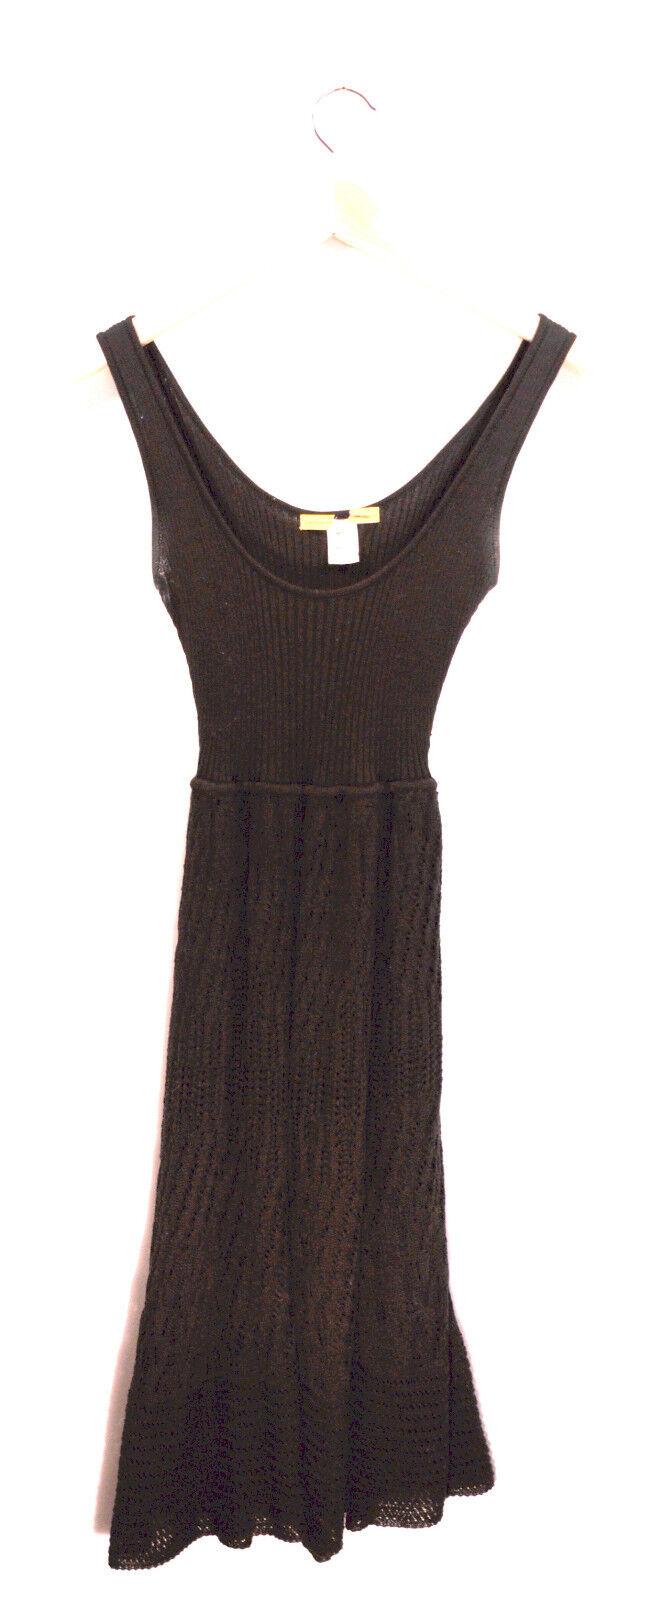 Small Catherine Malandrino schwarz Cotton Knit Dress